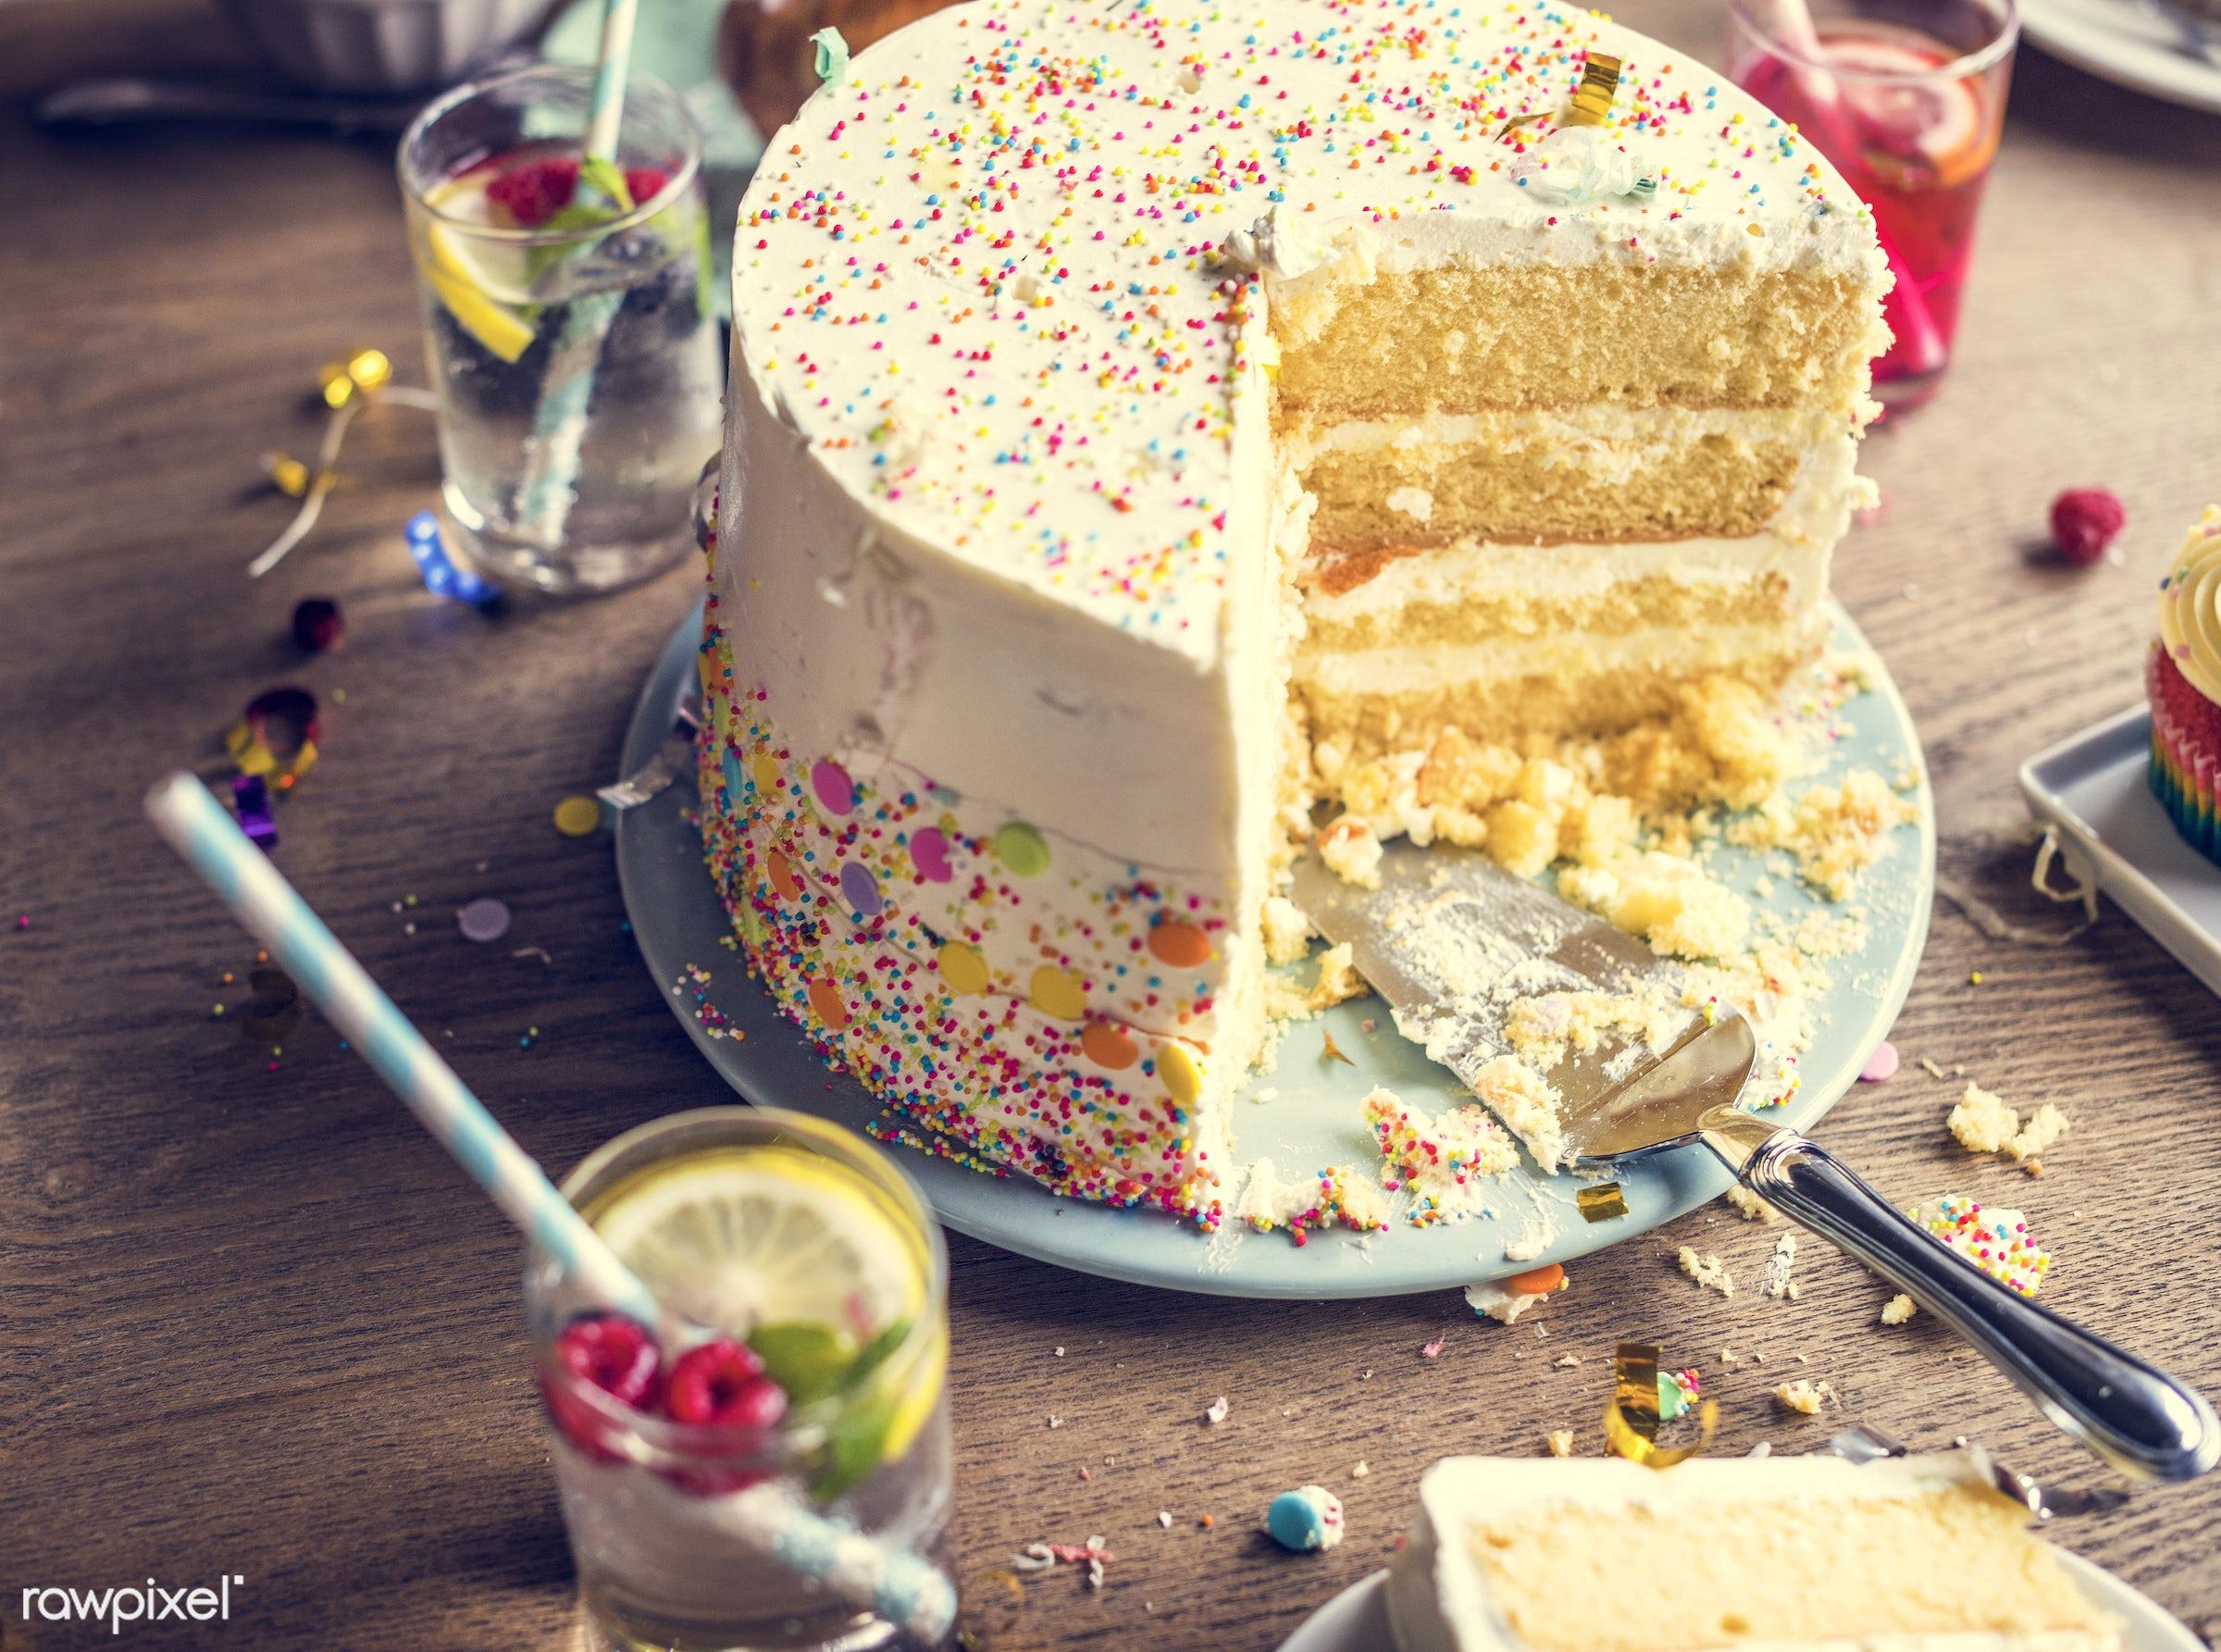 dish, nobody, recipe, party, tea, tea party, break, bakery, frosting, event, gourmet, dessert, cake, cream, tasty, sweet,...